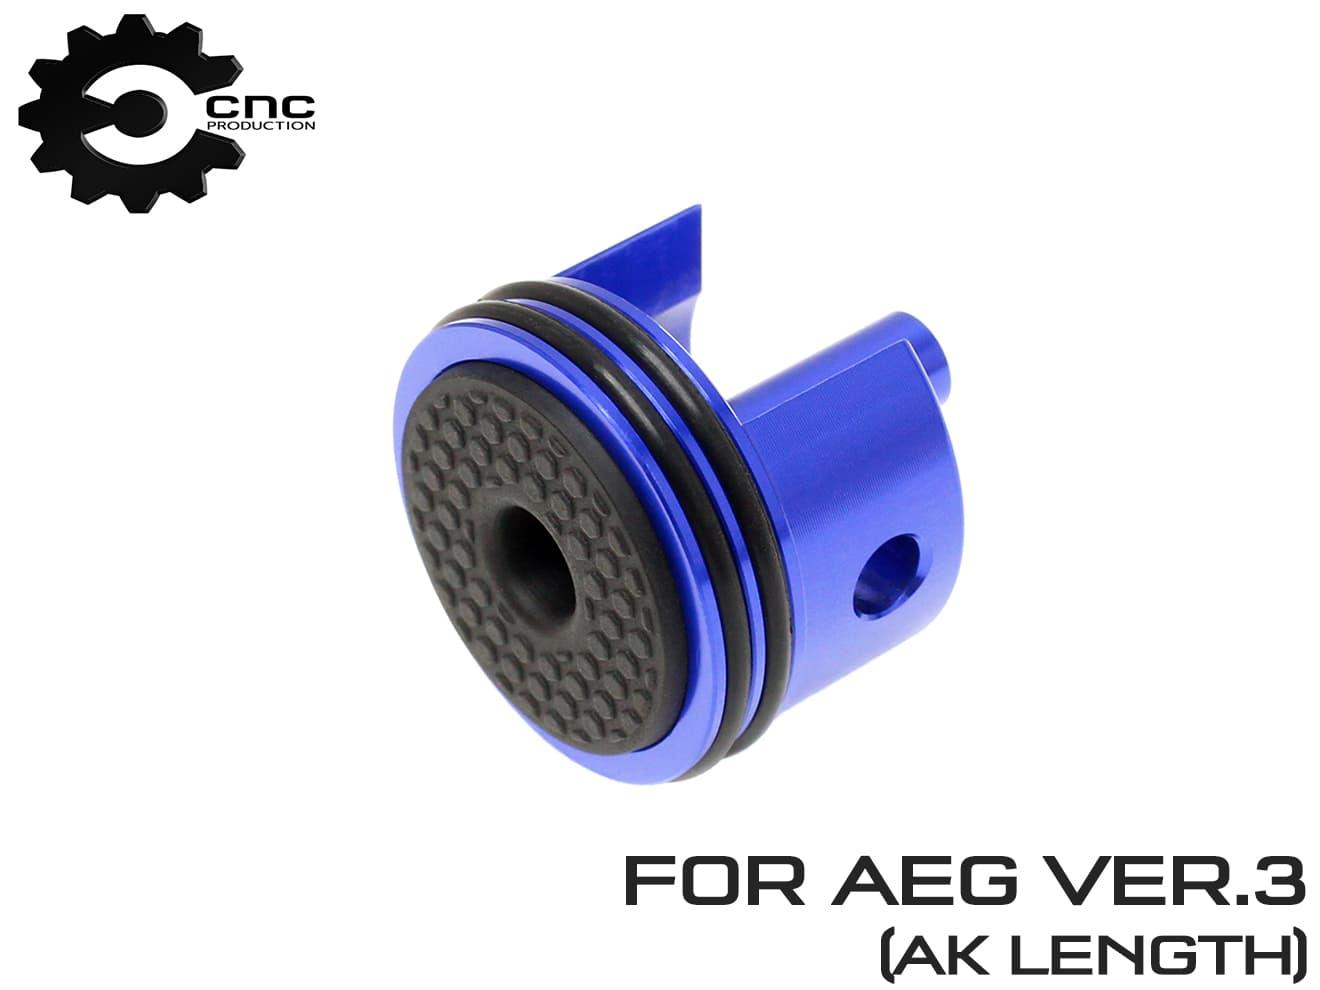 CNC-Production 耐衝撃性アップ シリンダーヘッド ダンパー 強化 電動 全国一律送料無料 AEG Ver3 バージョン3 超定番 AK47 G36C MP5K SIG552 マルイ CNC AK ARES AKノズル長 高精度 ディンプルダンパー APS Ver.3 GG アルミ製 Production ICS KRYTAC 電動ガン